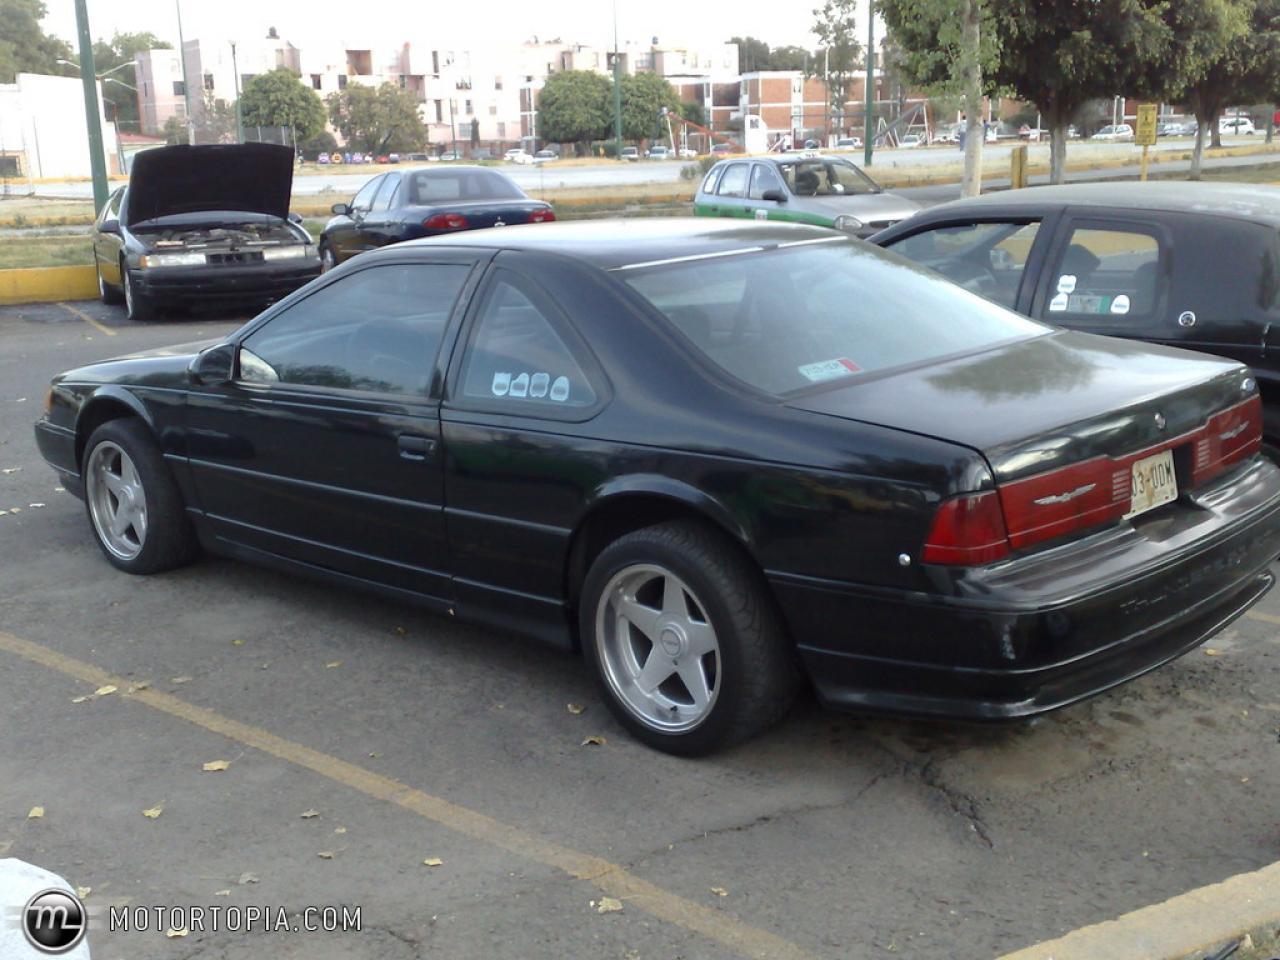 800 1024 1280 1600 origin 1990 Ford Thunderbird ...